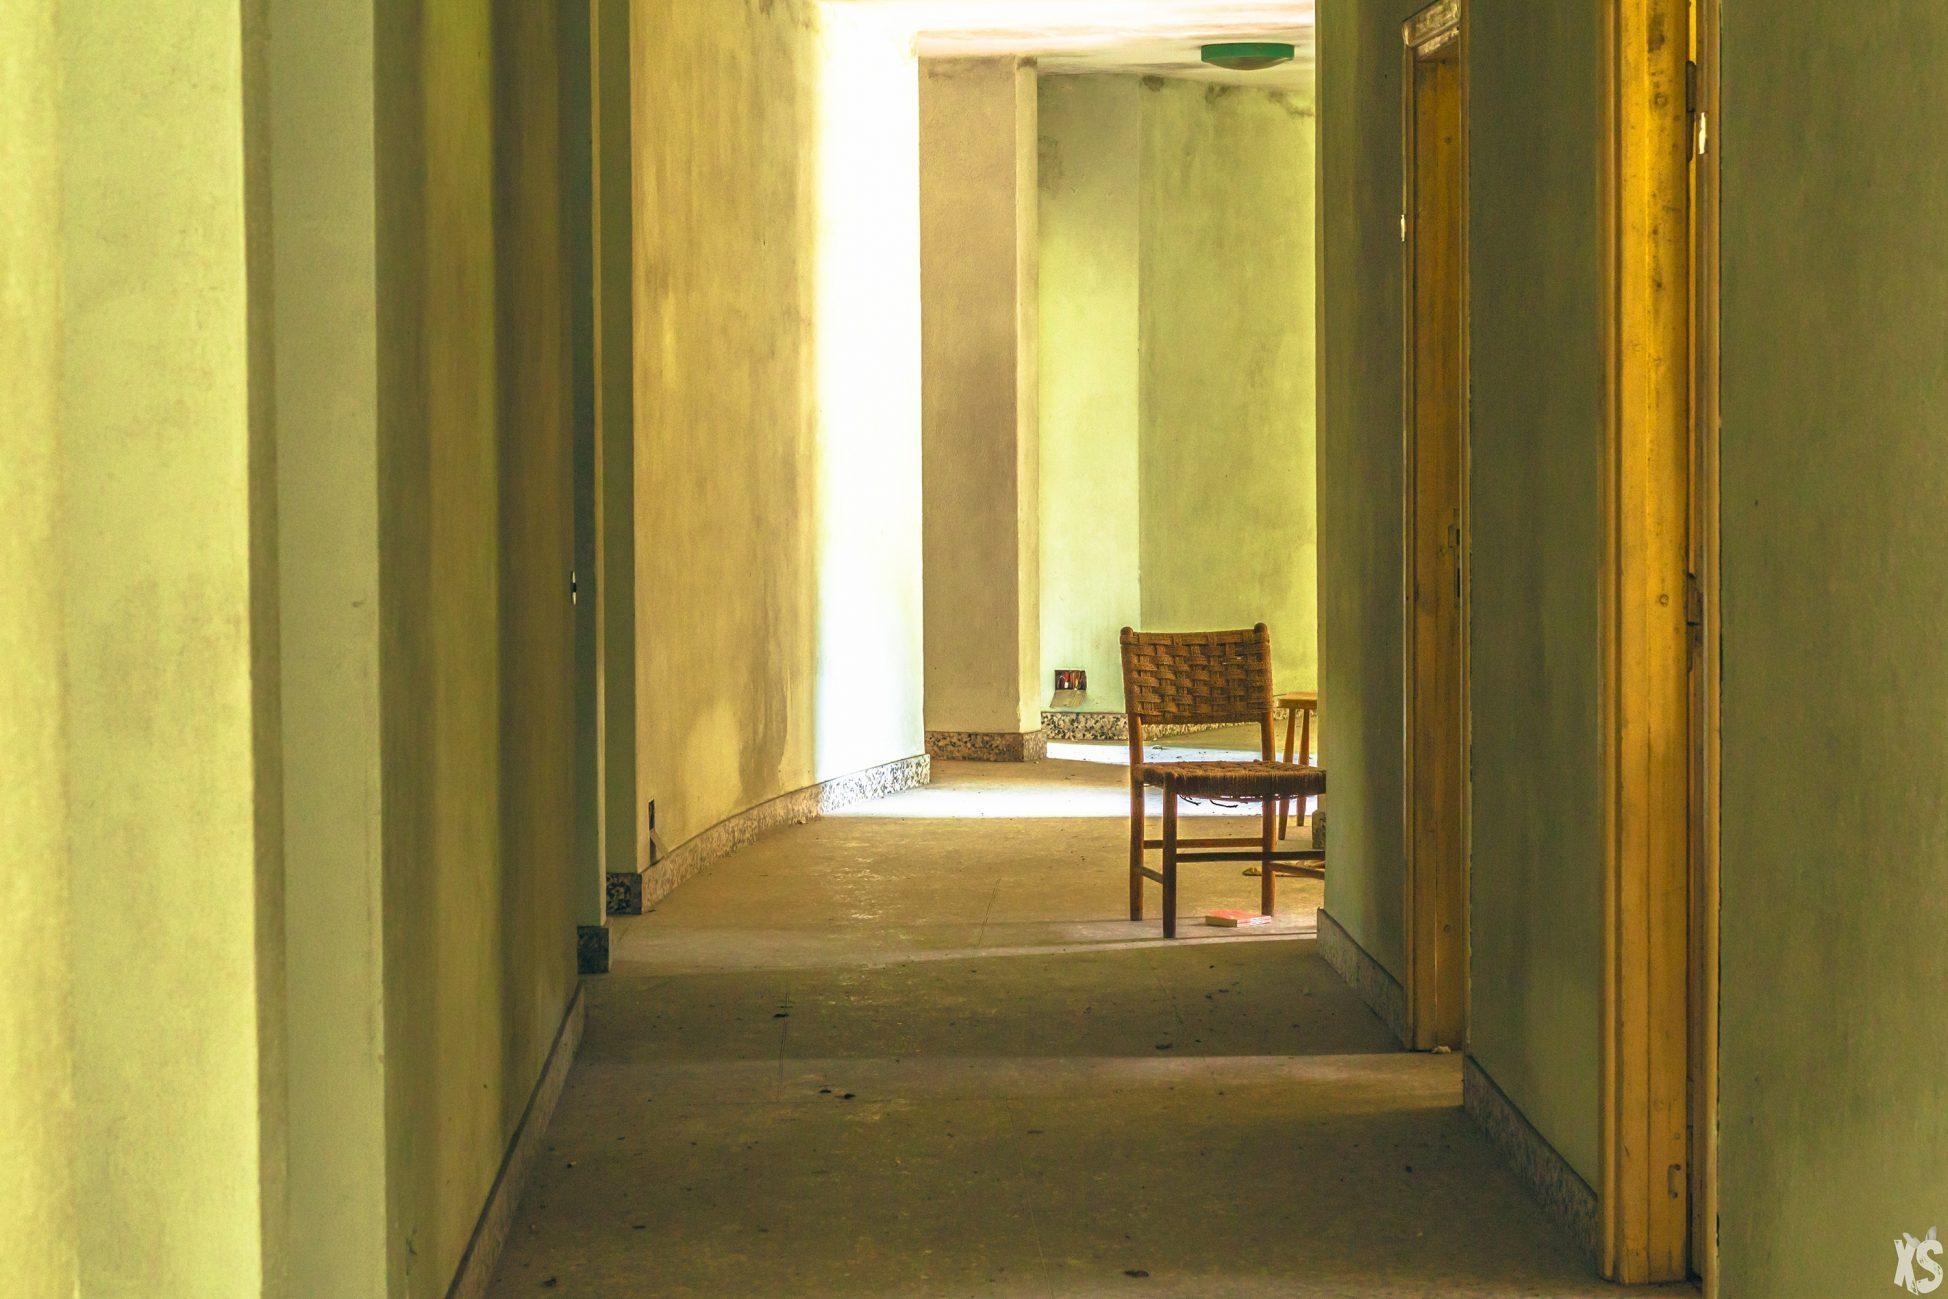 sanctuaire-bertha-gifford-13